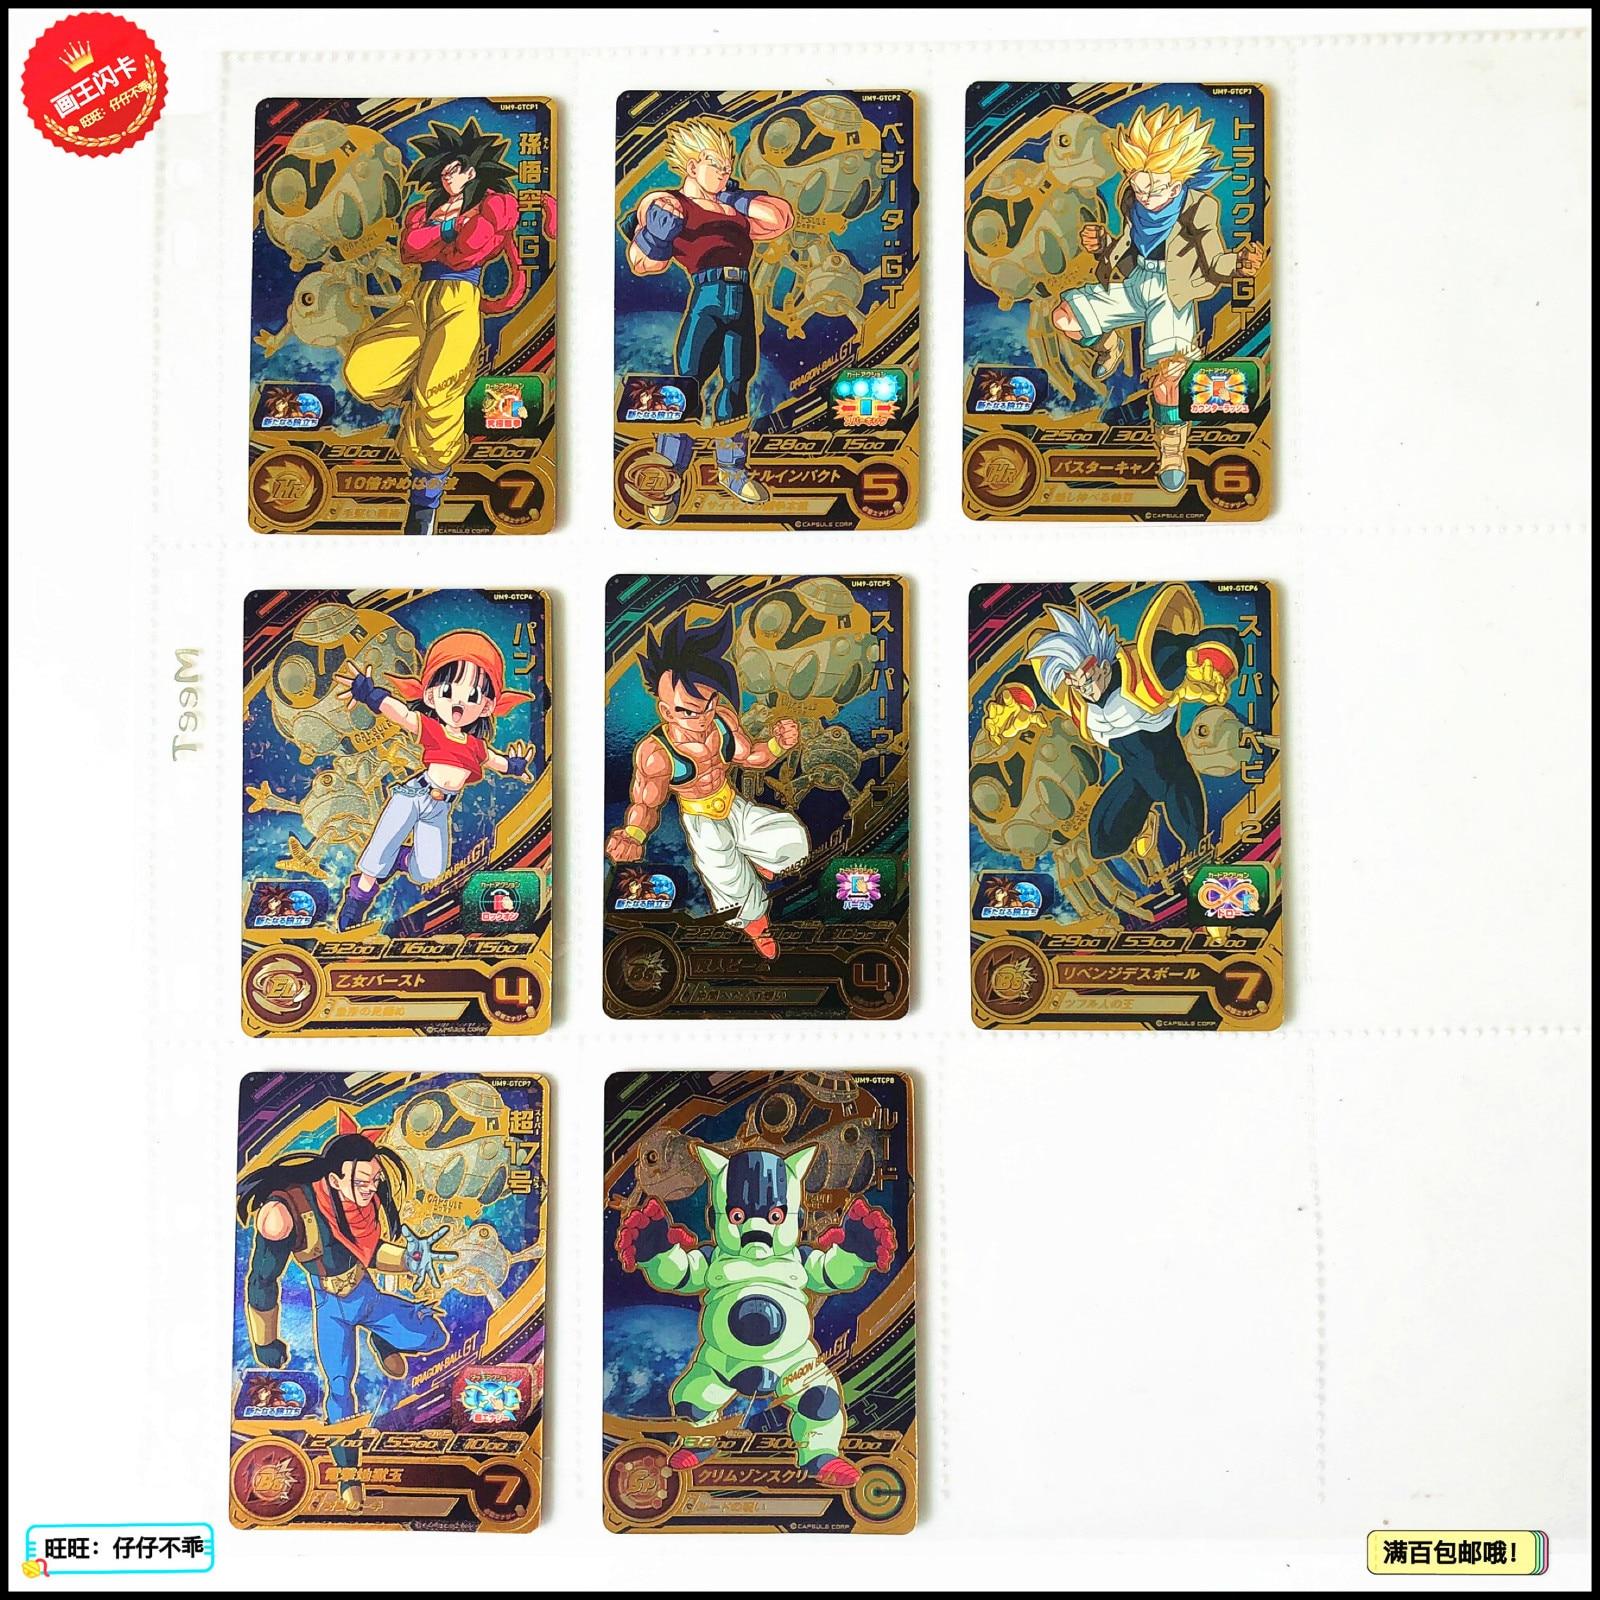 Japan Original Dragon Ball Hero Card UM9 GTCP Goku Toys Hobbies Collectibles Game Collection Anime Cards